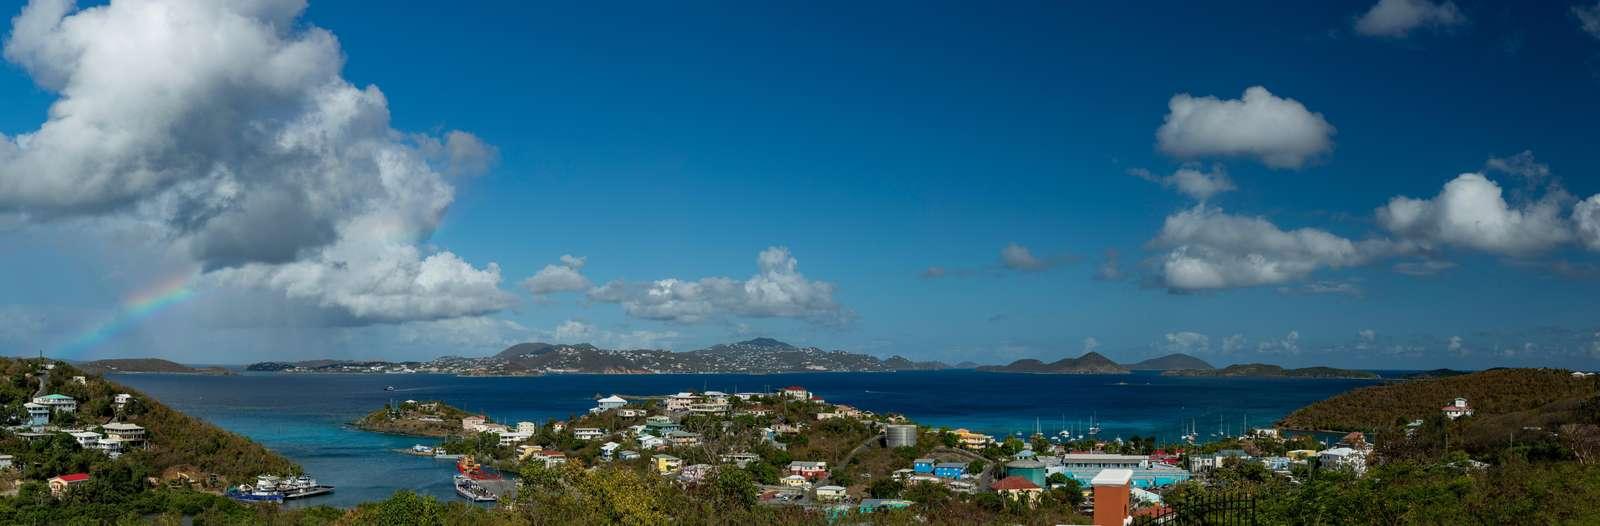 View of Cruz Bay from Villa